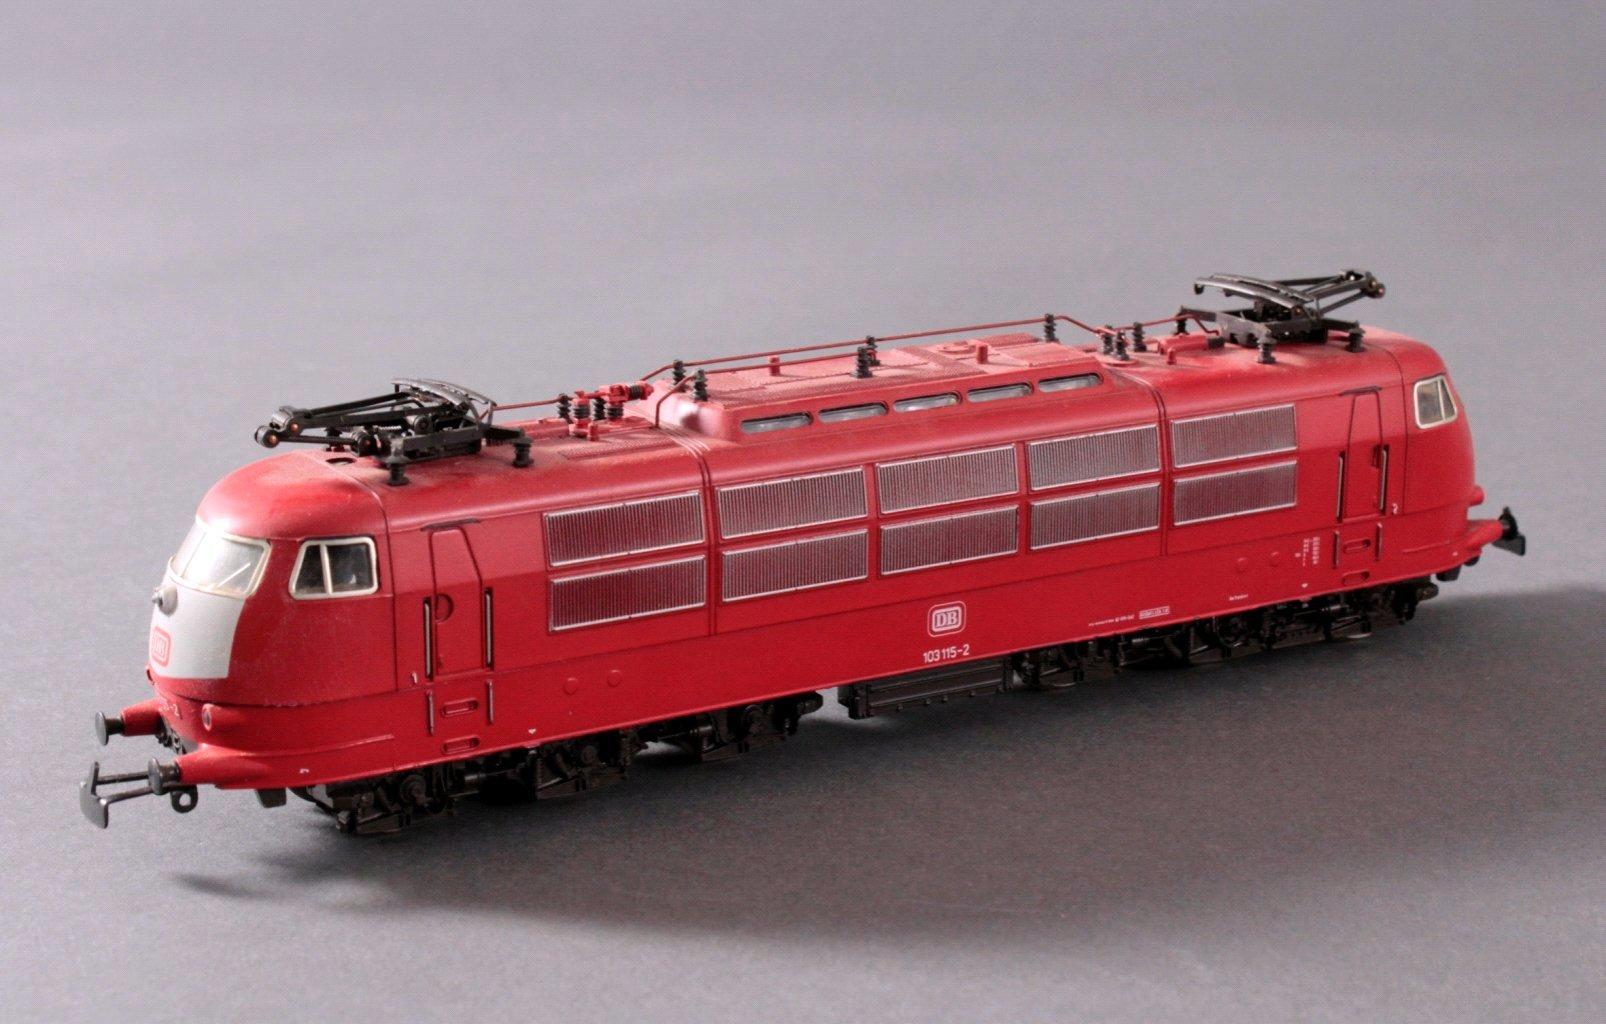 Märklin H0 3357 E-Lok Baureihe 103 115-2 DB in rot mit-1